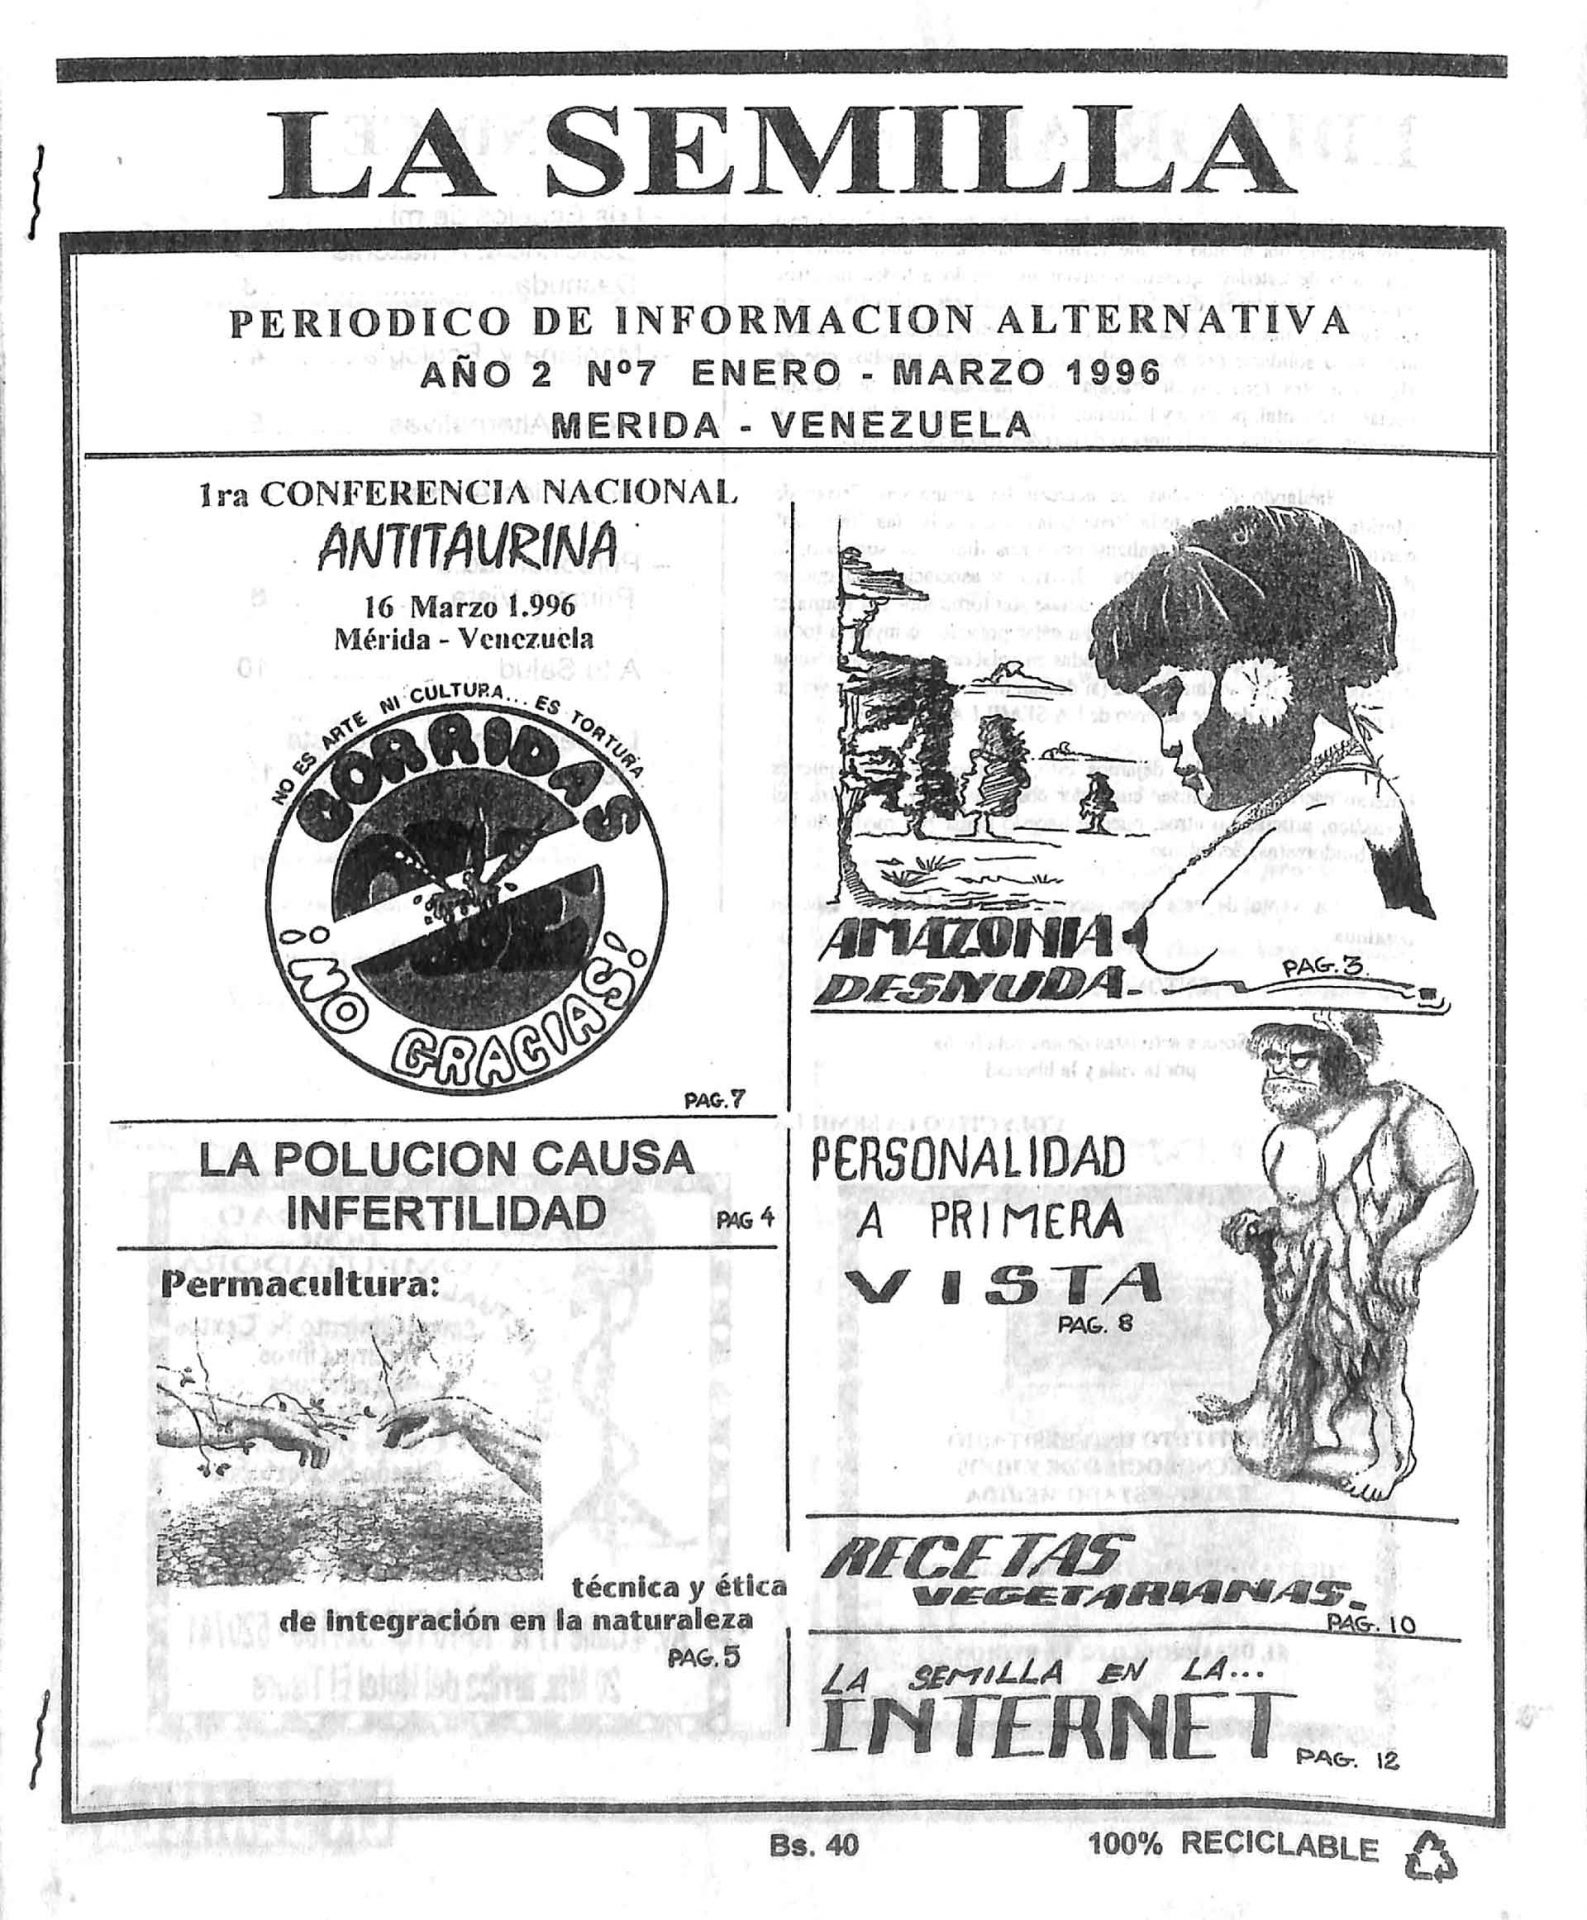 La Semilla No. 7, 1996